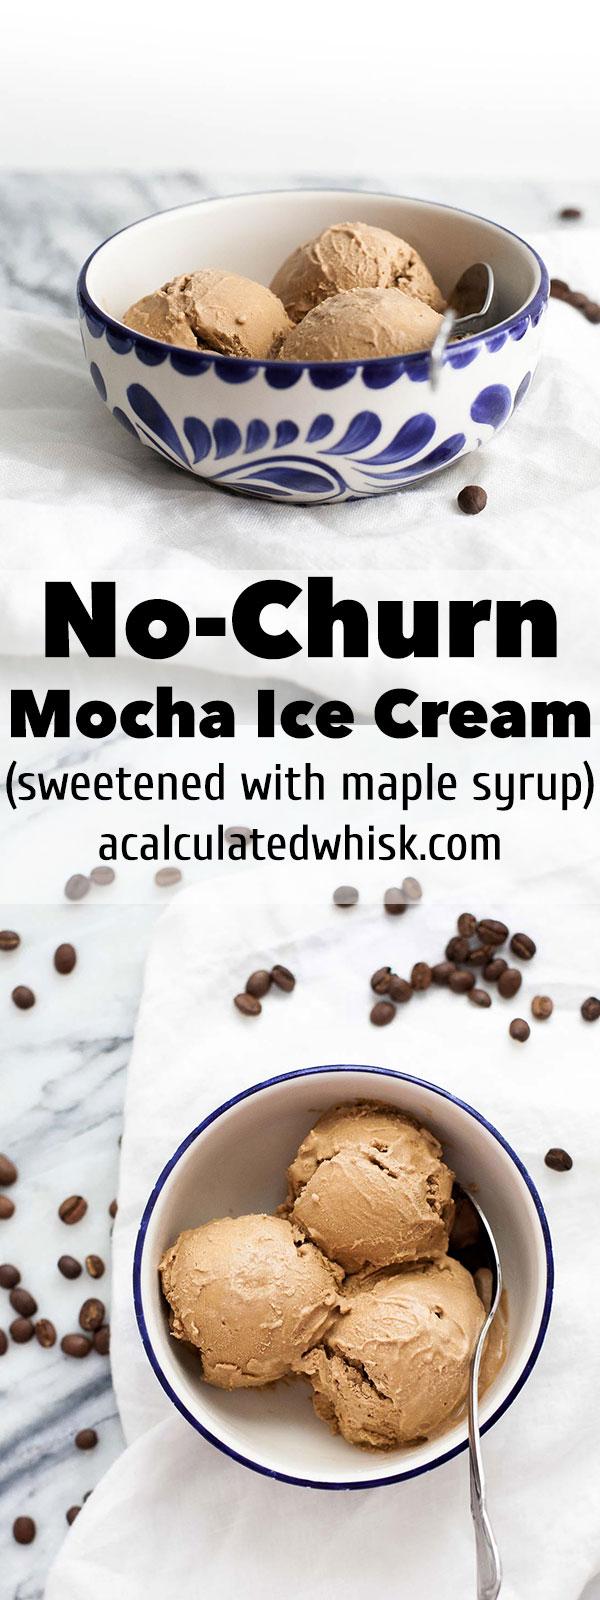 No-Churn Mocha Ice Cream (endulzado con jarabe de arce) | acalculatedwhisk.com